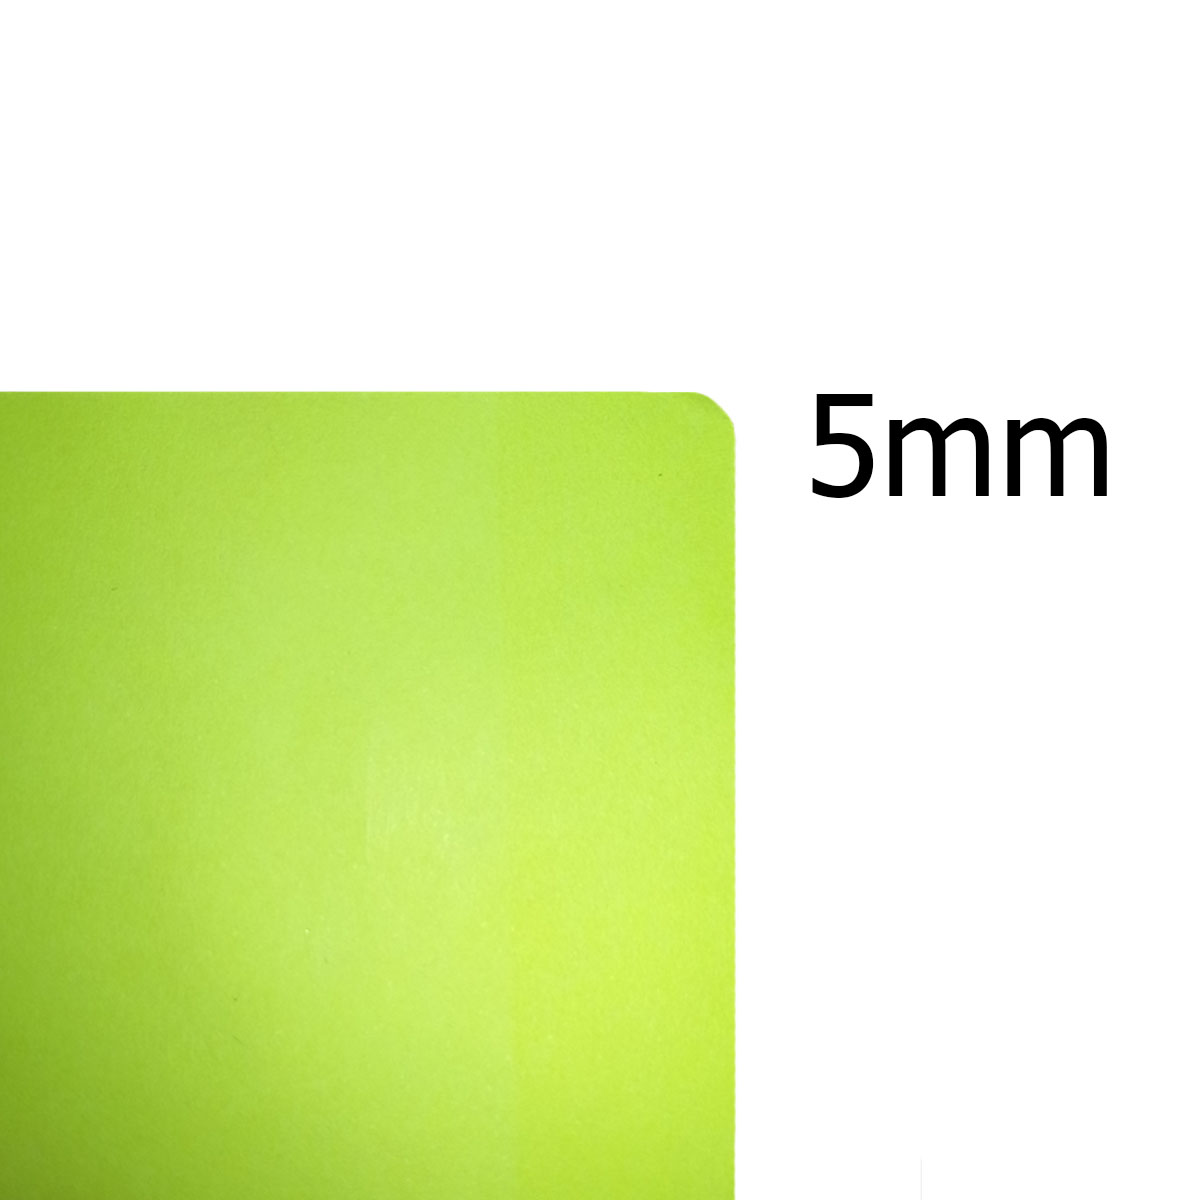 Mini Canteadeira Portátil Raio De 5 Mm